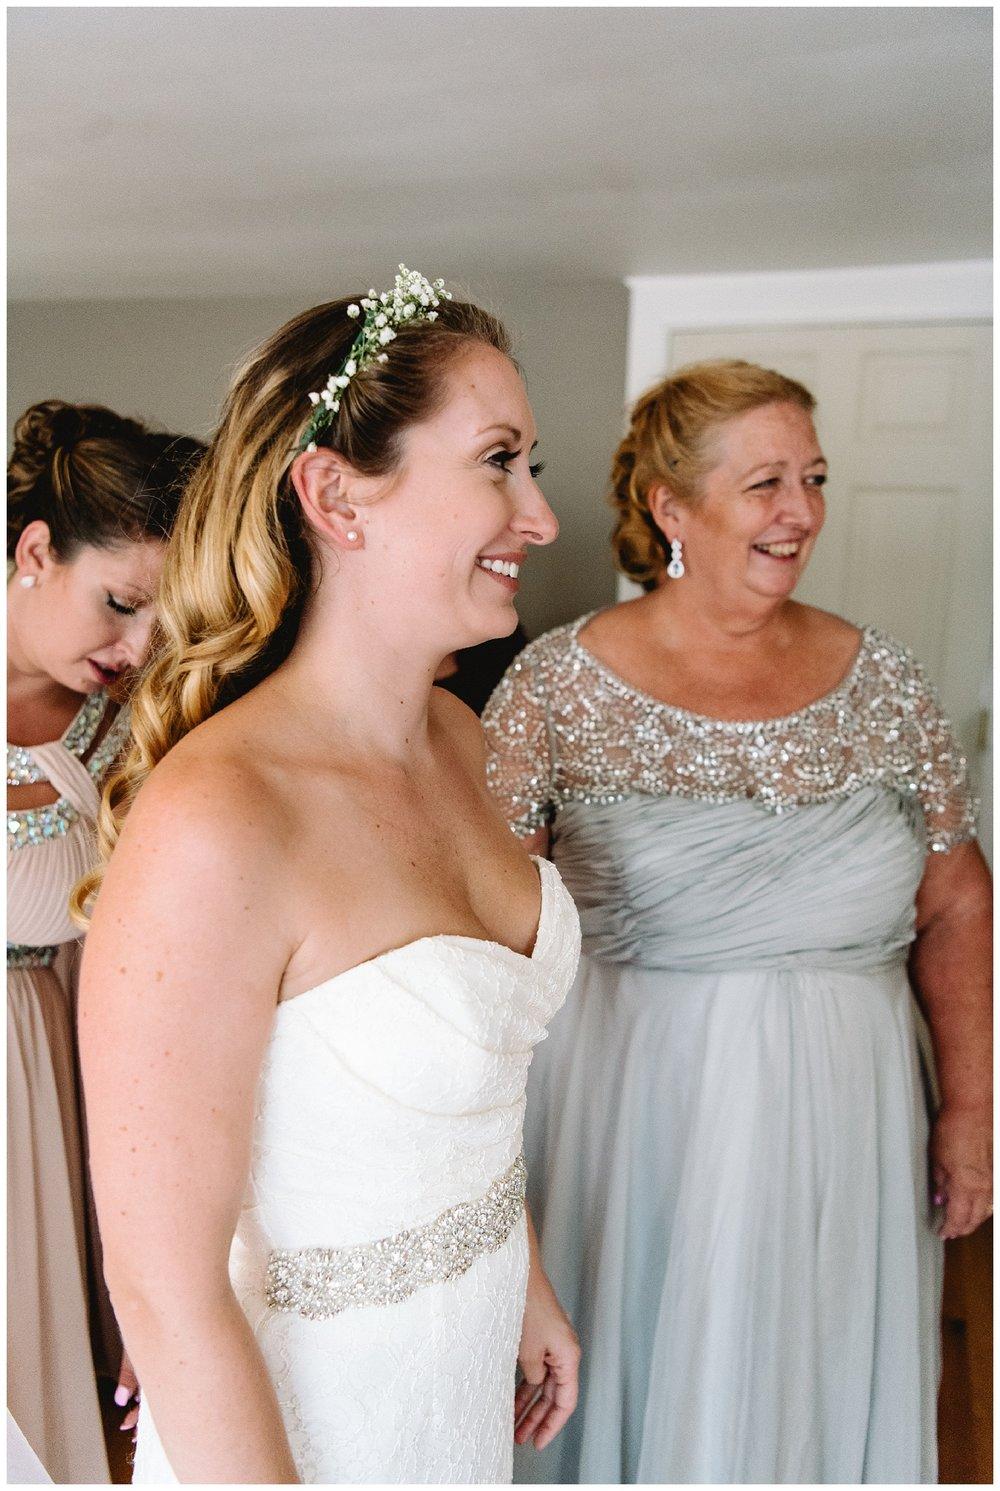 2016-09-02_0023Whimsical Backyard Summer Wedding Peabody MA Wedding Photographer.jpg